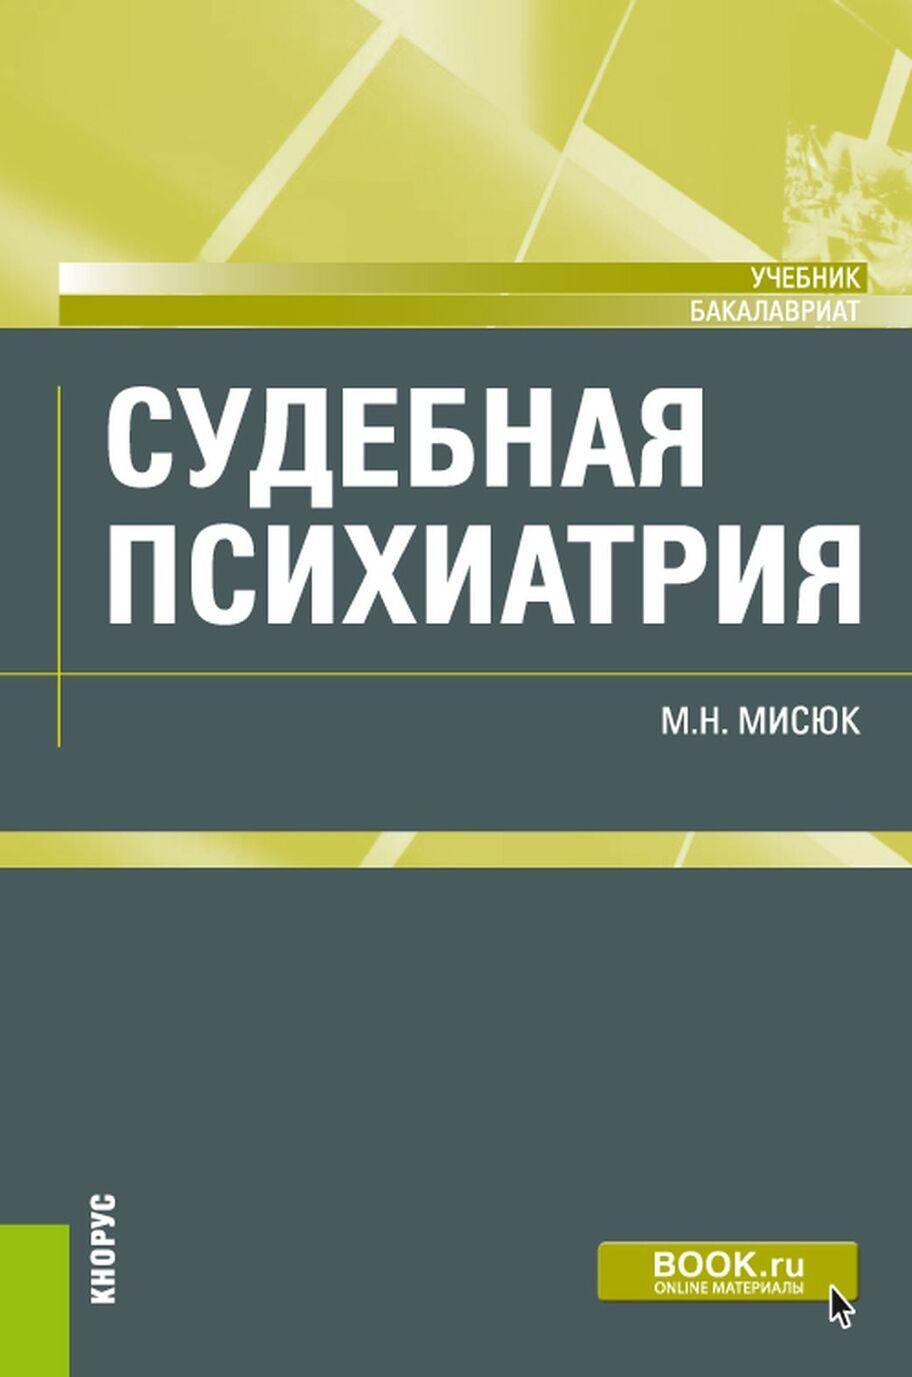 Sudebnaja psikhiatrija. Uchebnik | Misjuk Marina Nikolaevna